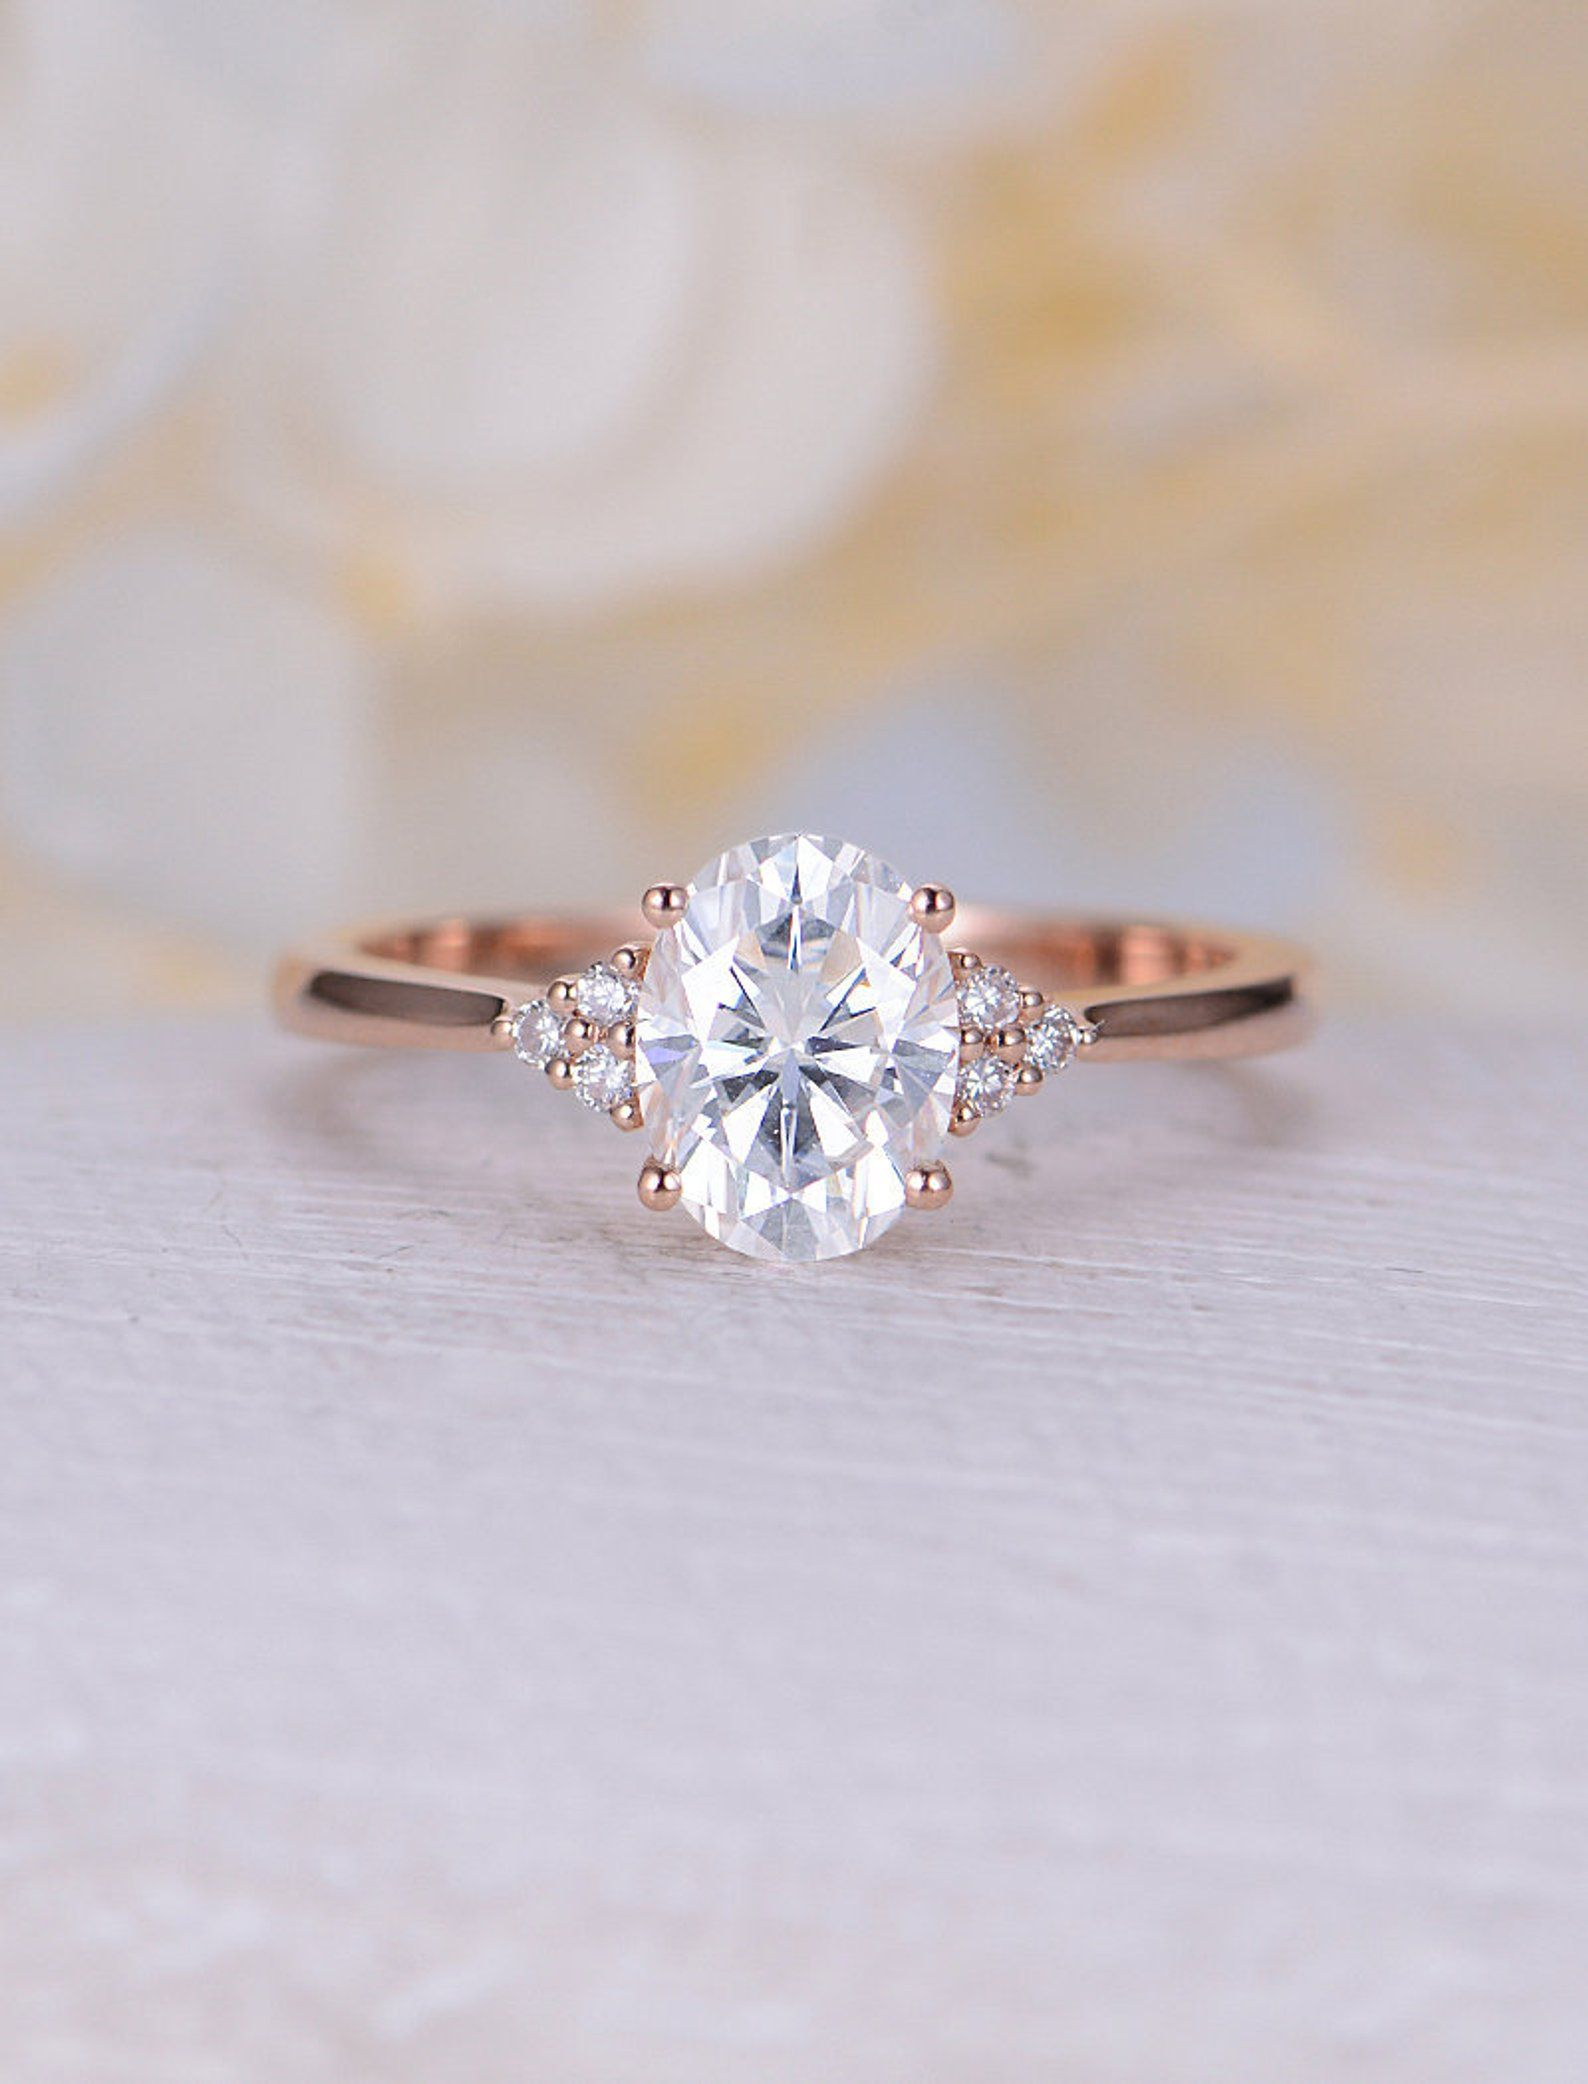 Vintage Moissanite Engagement Ring Rose Gold Engagement Ring Etsy Gold Oval Engagement Ring Rose Gold Engagement Ring Vintage Rose Gold Oval Engagement Ring